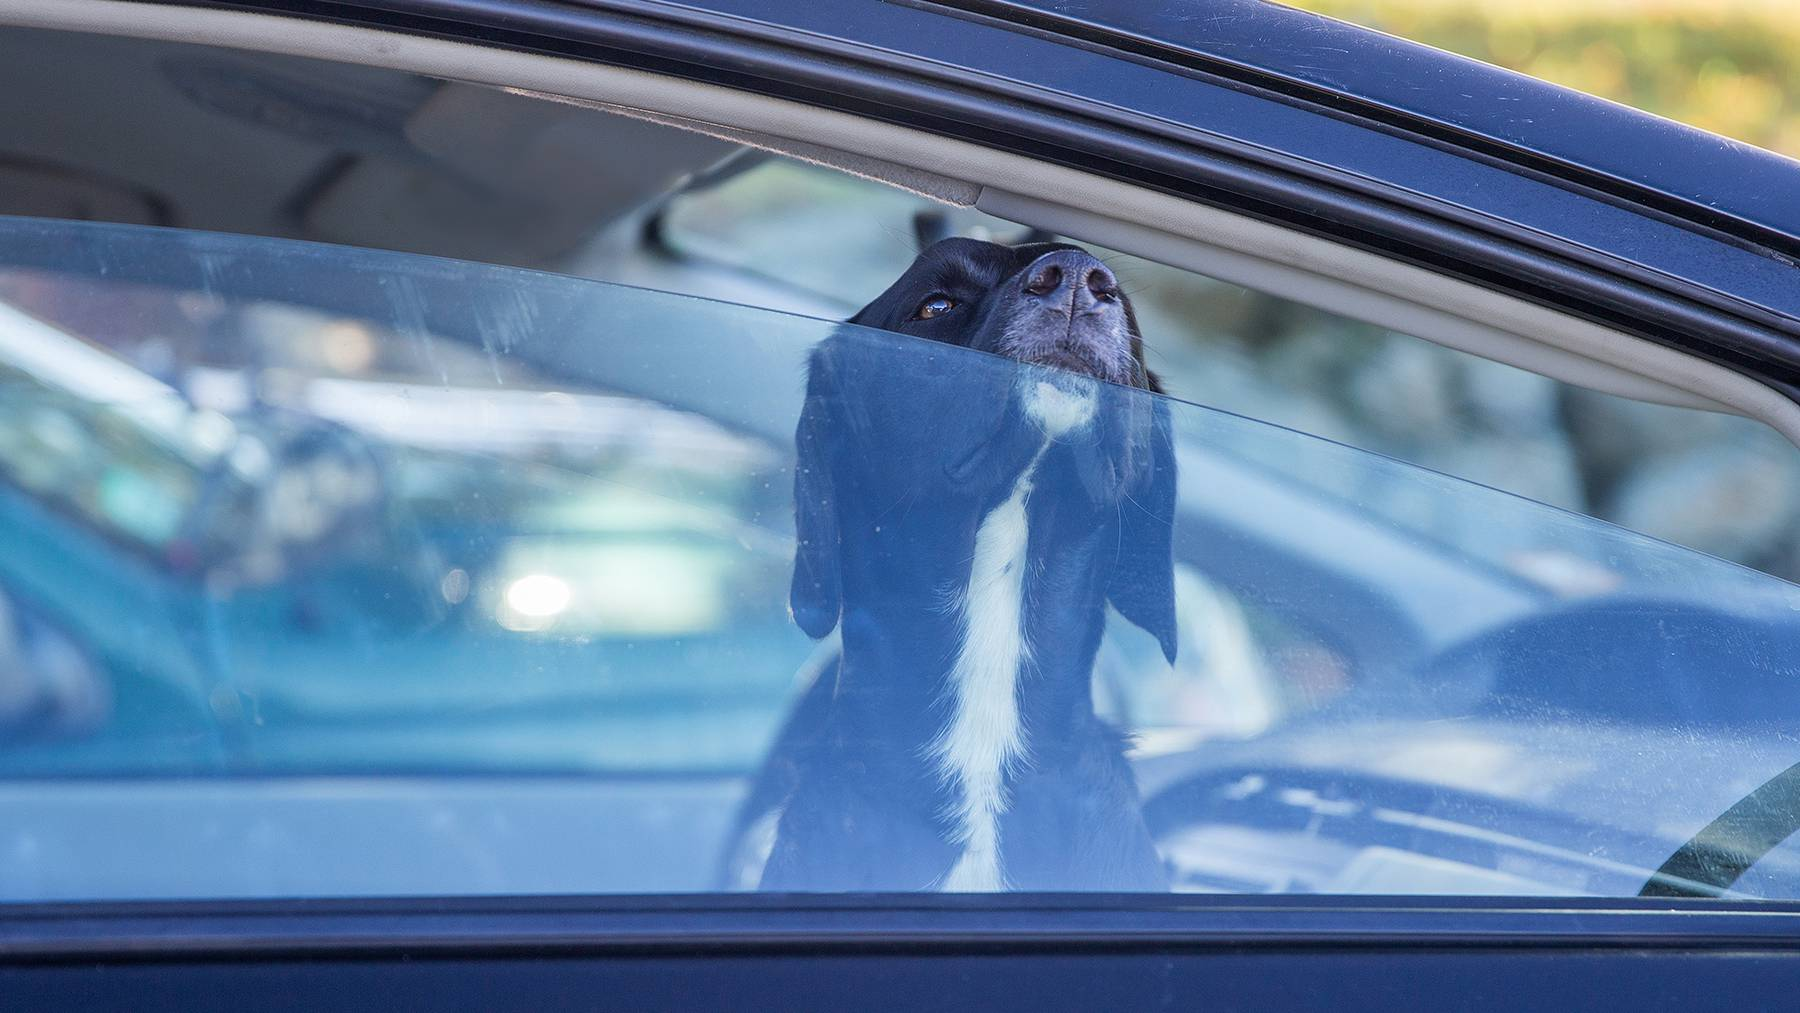 Hund Hitze Auto